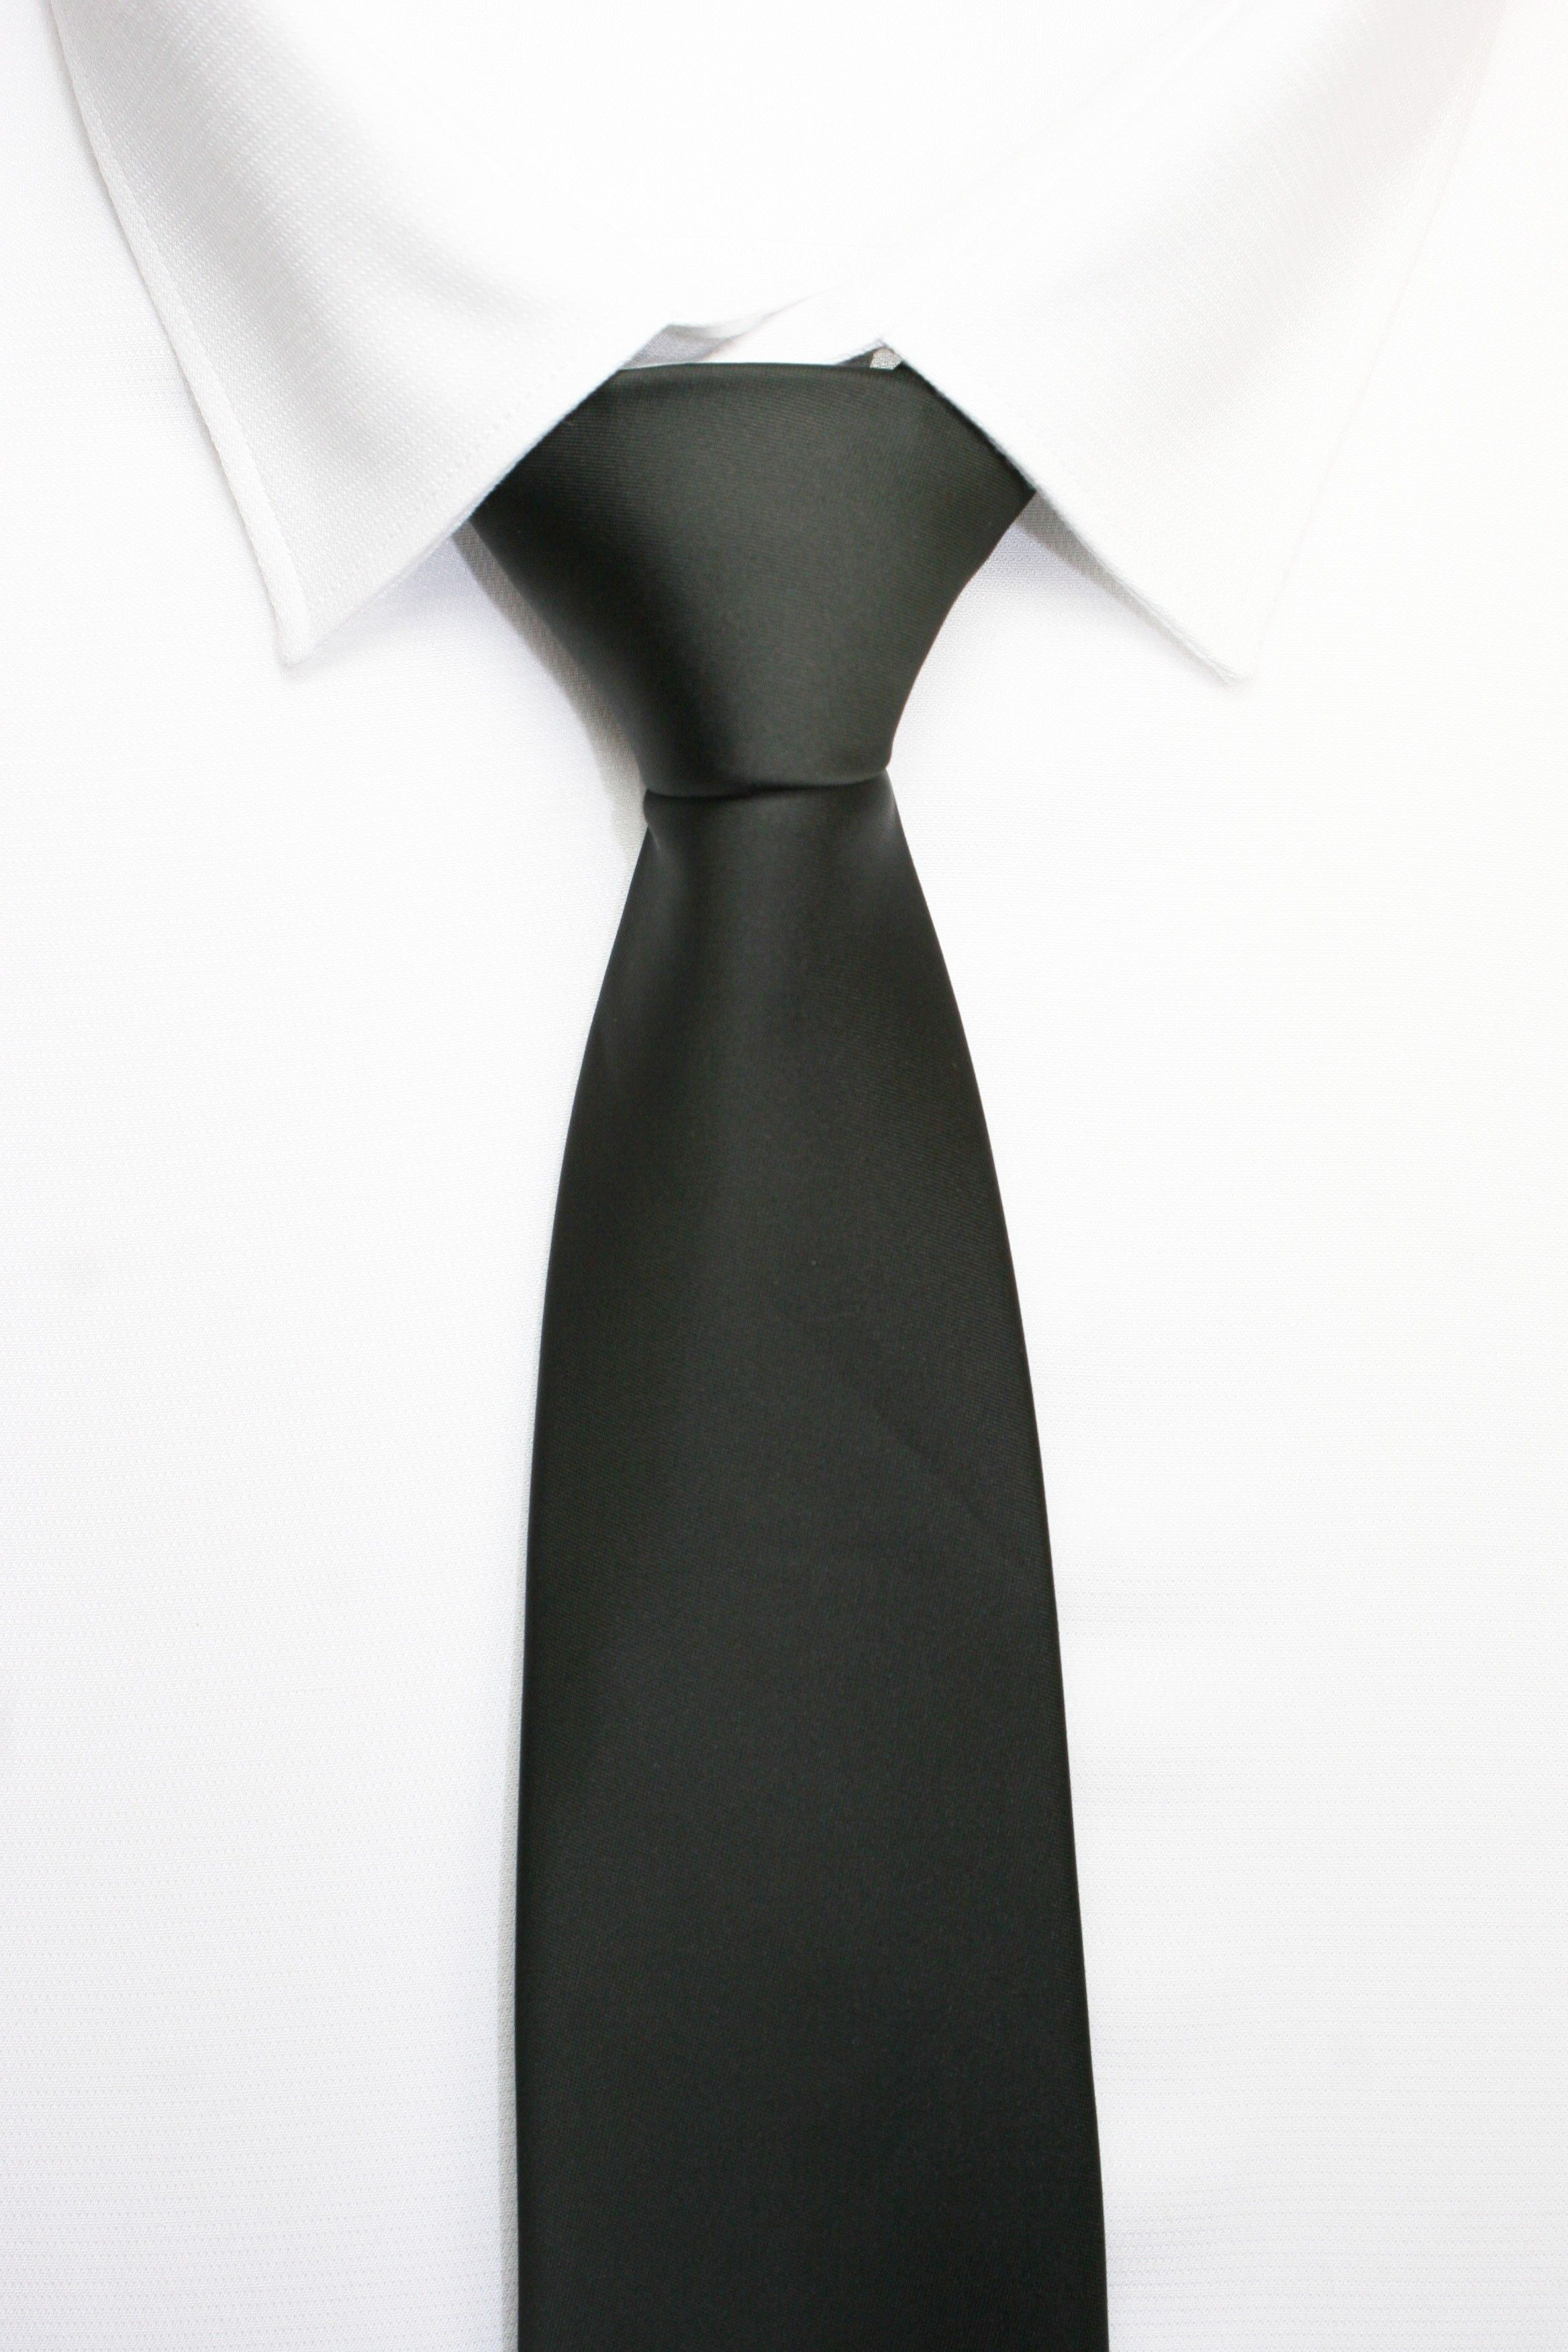 Comprar Corbata Clasica Negra Online | KNOT | Corbatas